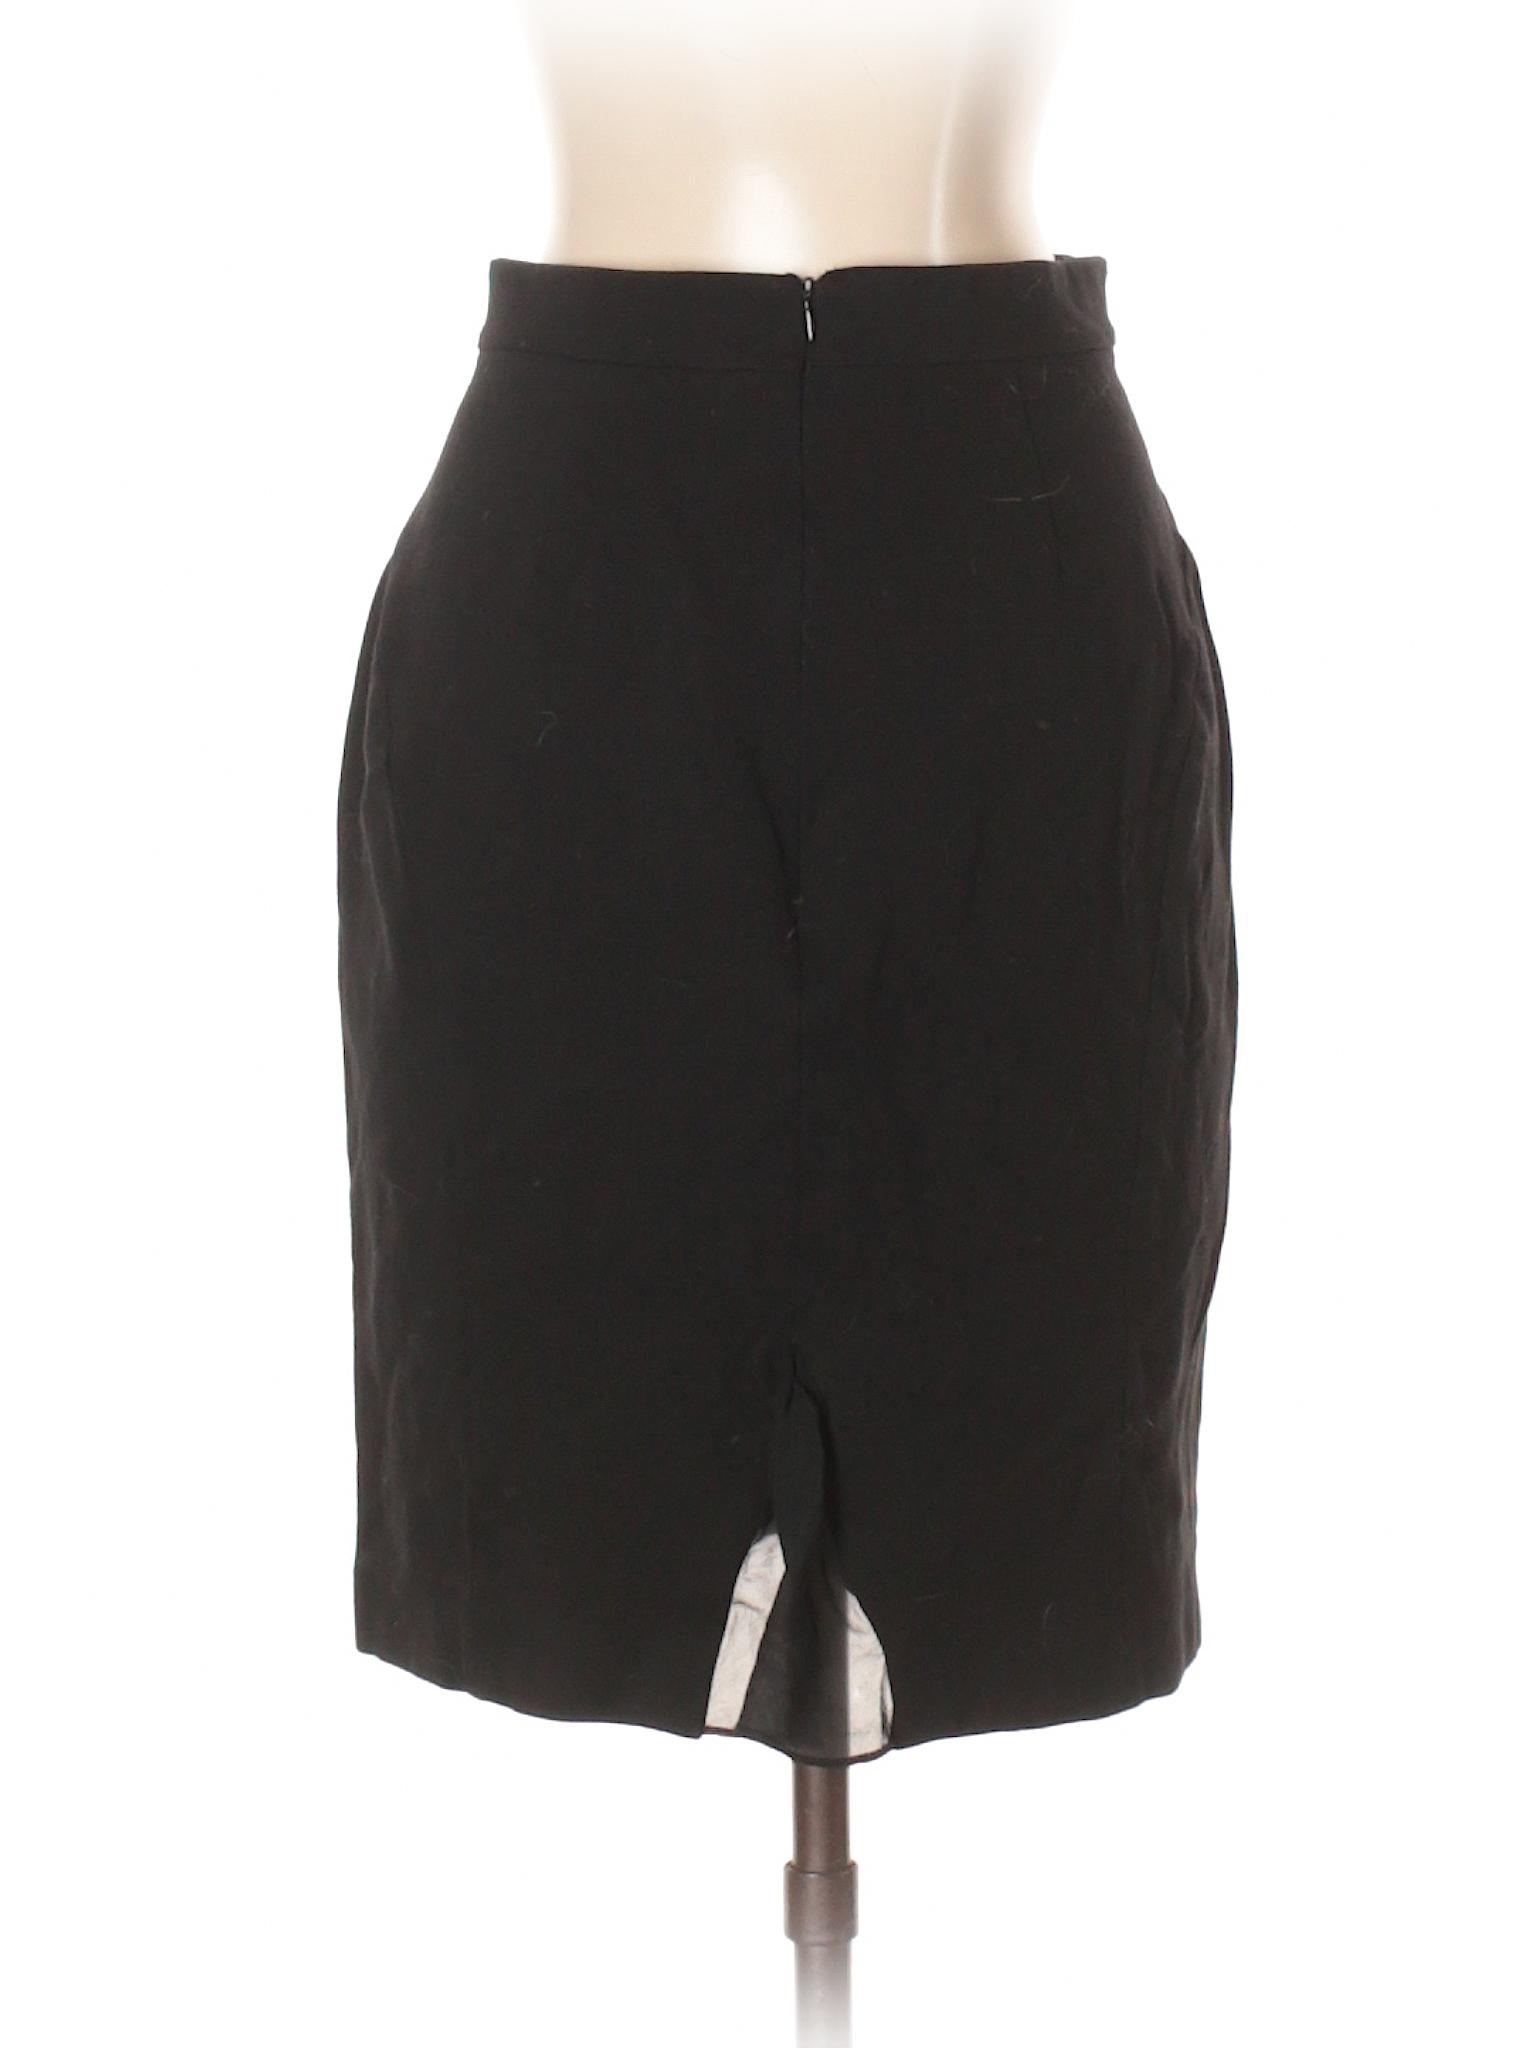 Boutique Casual Casual Boutique Skirt rwOrSq1F